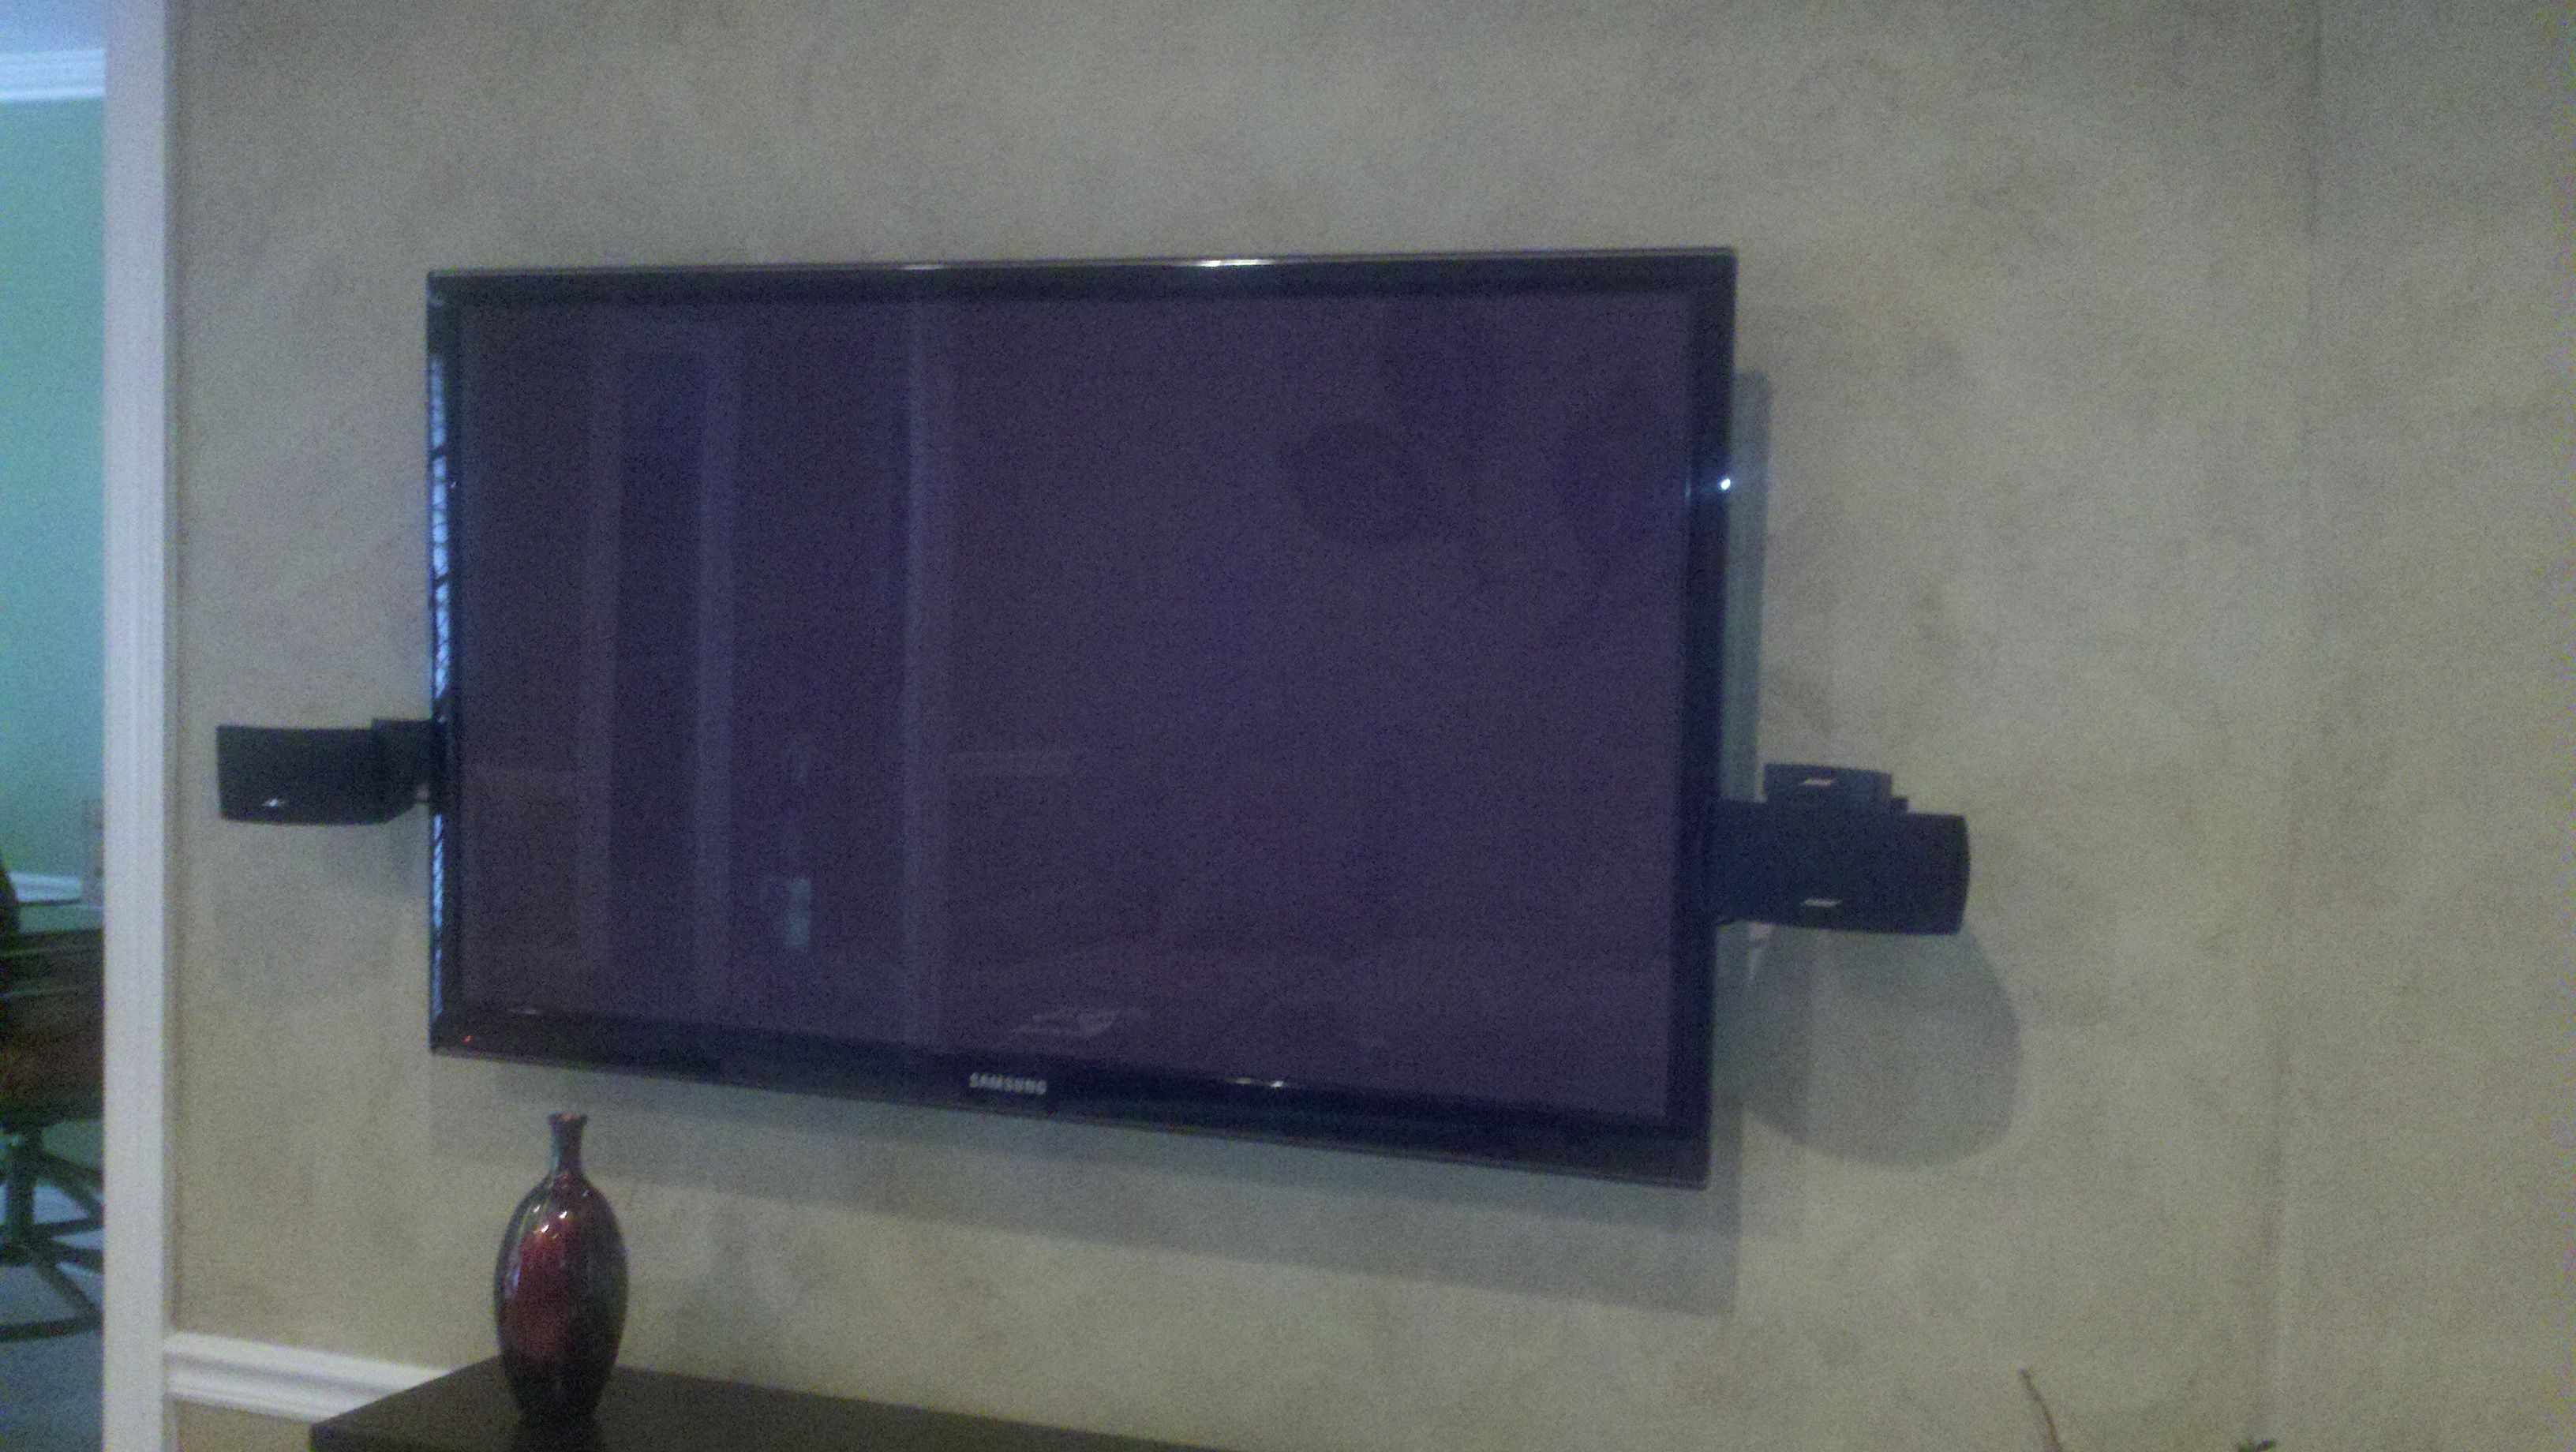 No Stud Tv Hanger Hang Flat Screen Tv Wall Mounted Tv Tv Wall